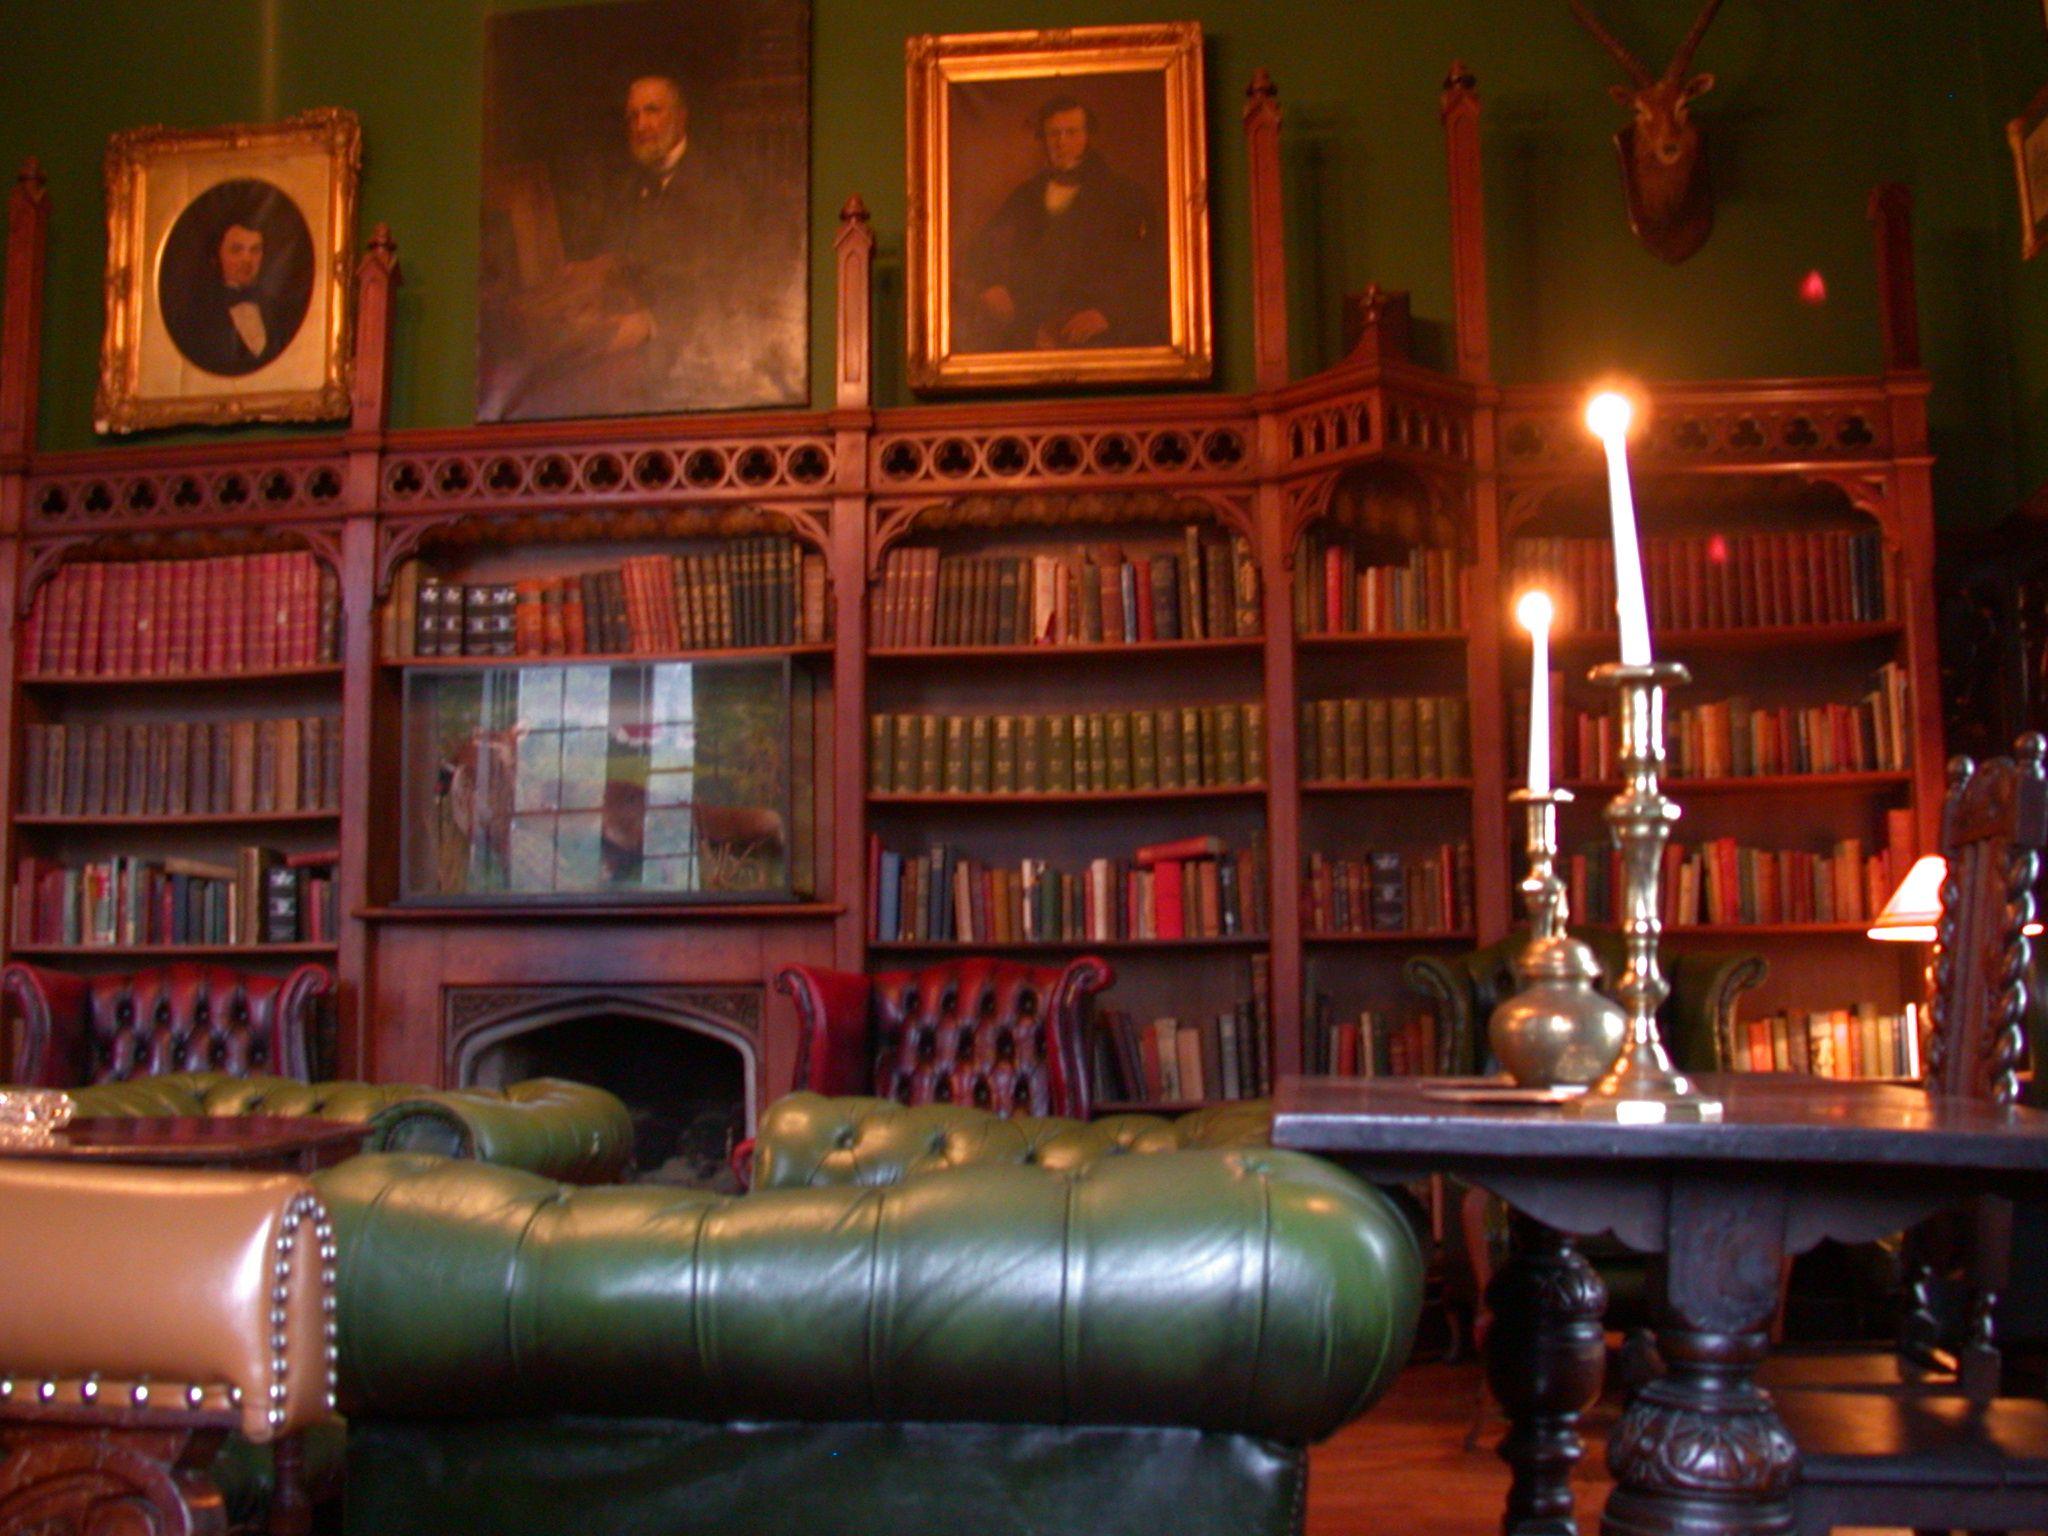 smoking room smoking gentlemen gentlemens club leather sofa sofas stock image the dome. Black Bedroom Furniture Sets. Home Design Ideas